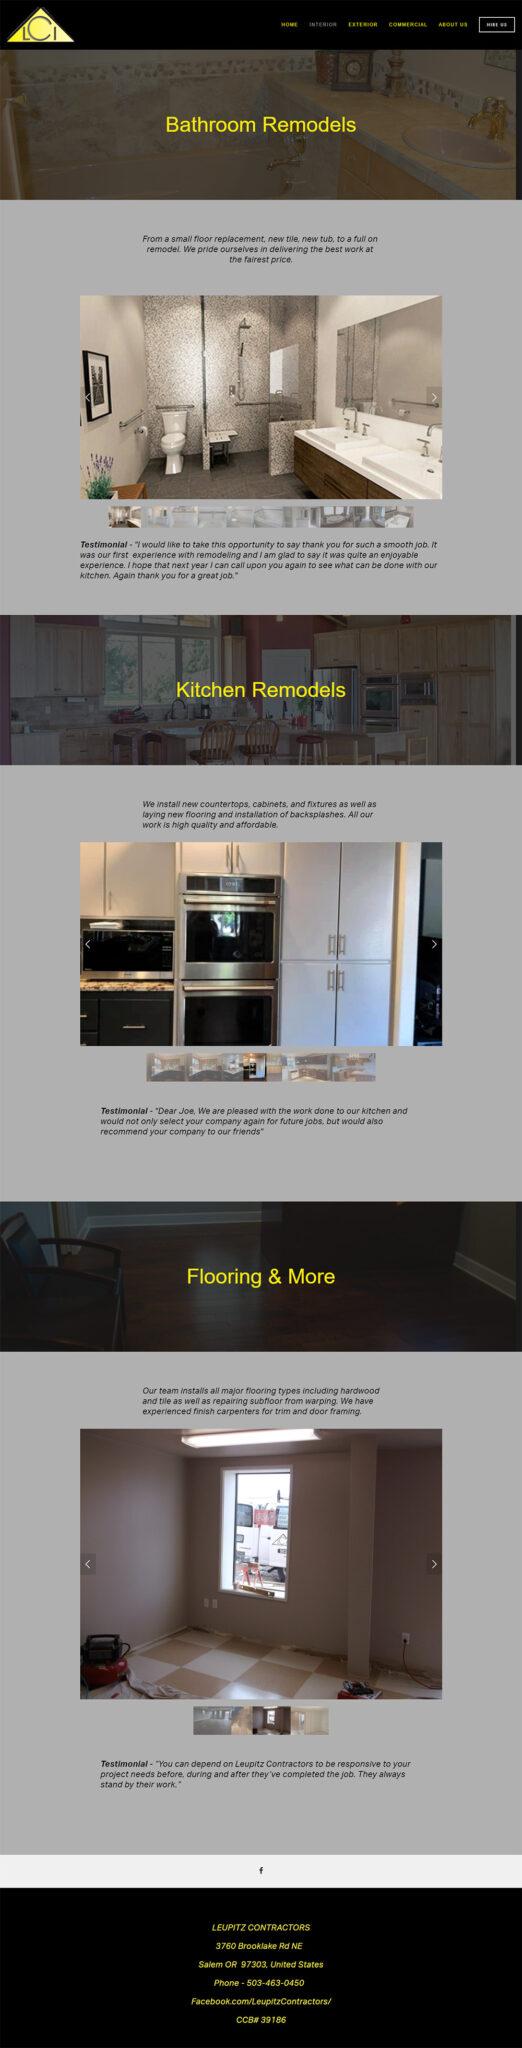 Leupitz Contractors interiors page before redesign